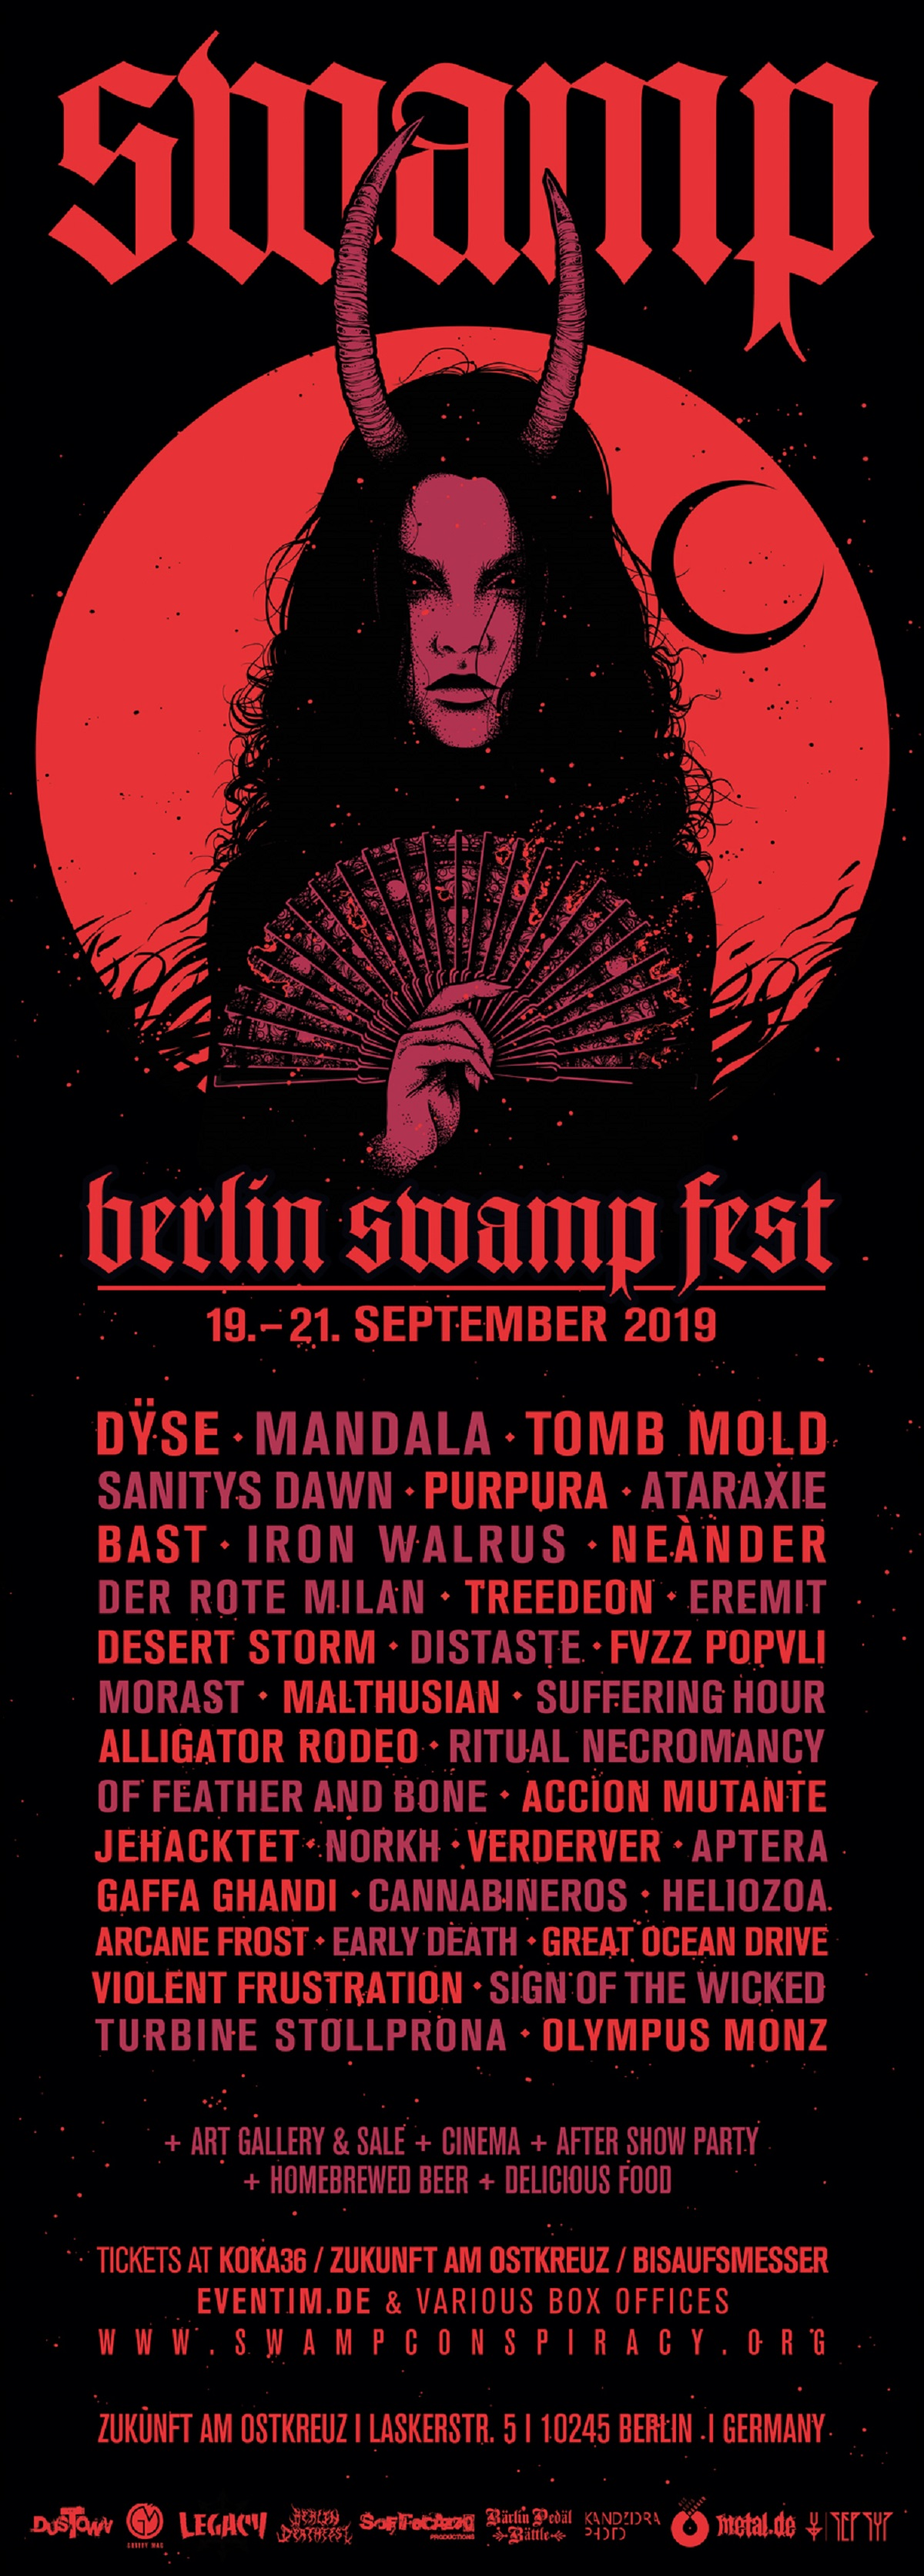 Berlin Swamp Fest 2019